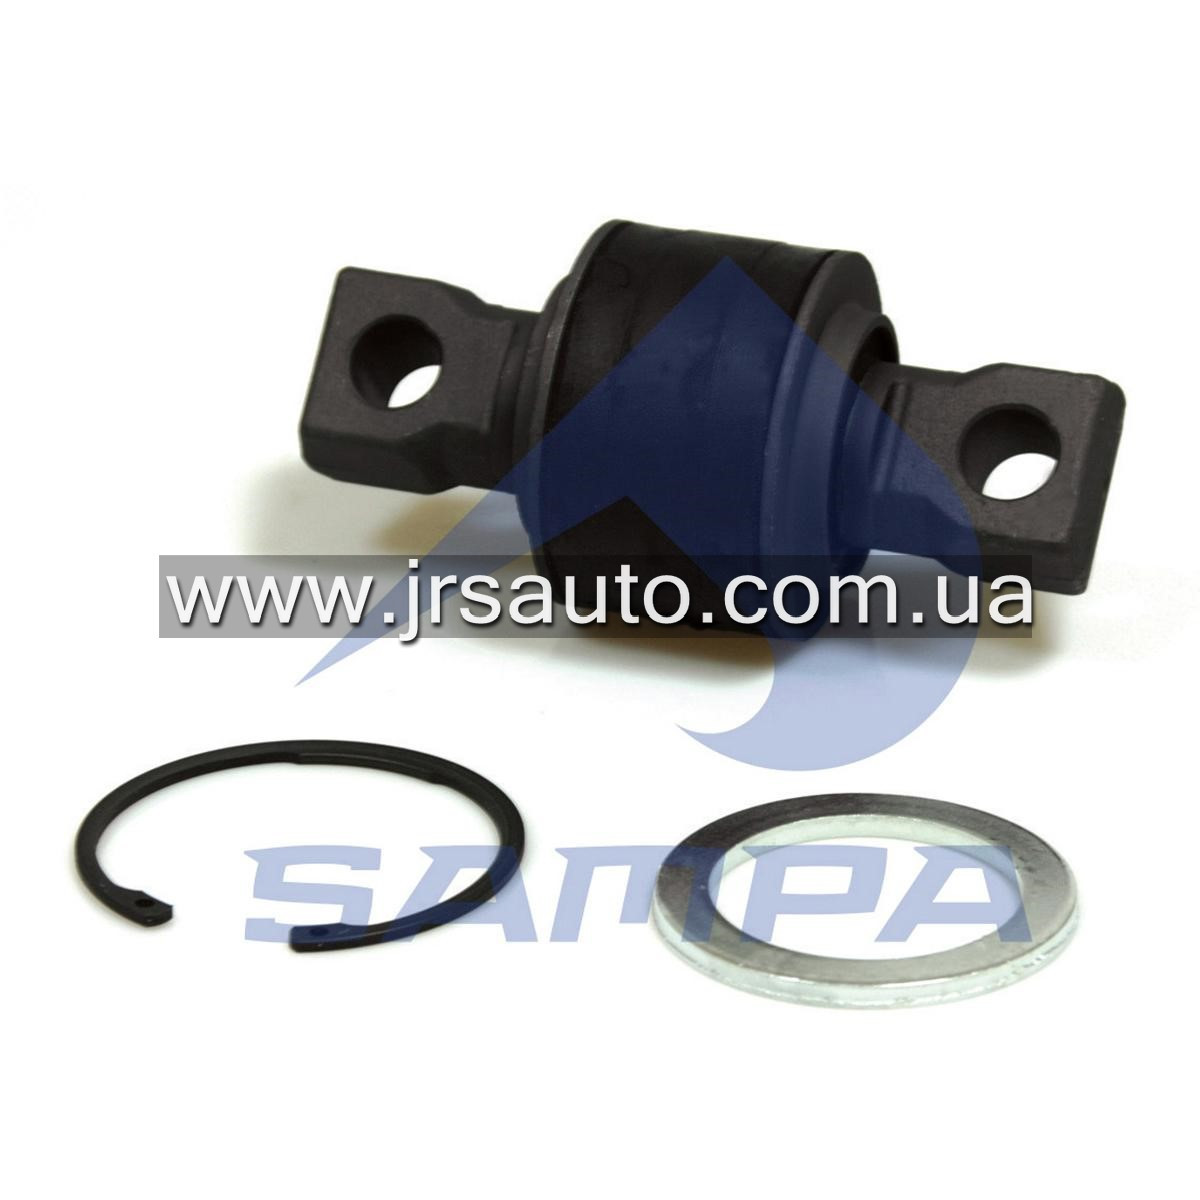 Ремкомплект тяги реактивной MAN (d80xd19/130) \81432306043S \ 020.534